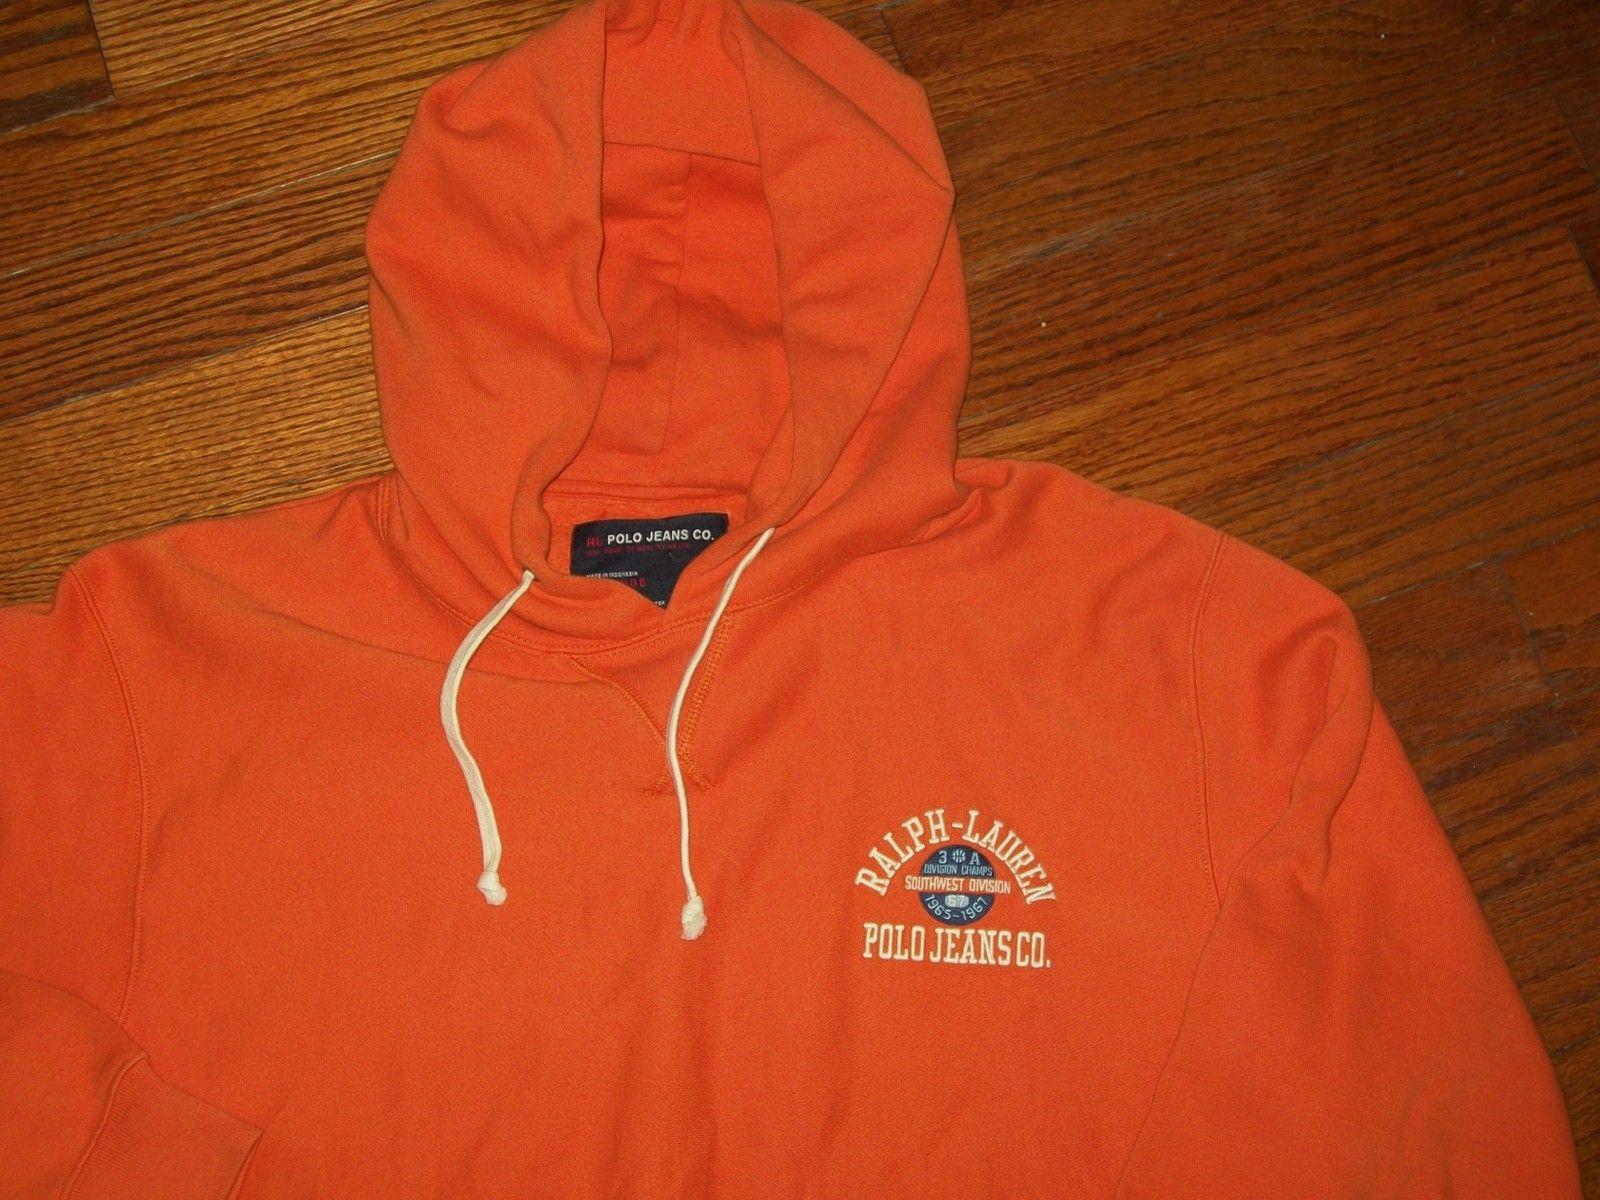 Jeans Co Hoodie Orange Ralph Lauren Sweatshirt Xl Mens 1965 Polo 3TlcF5u1JK